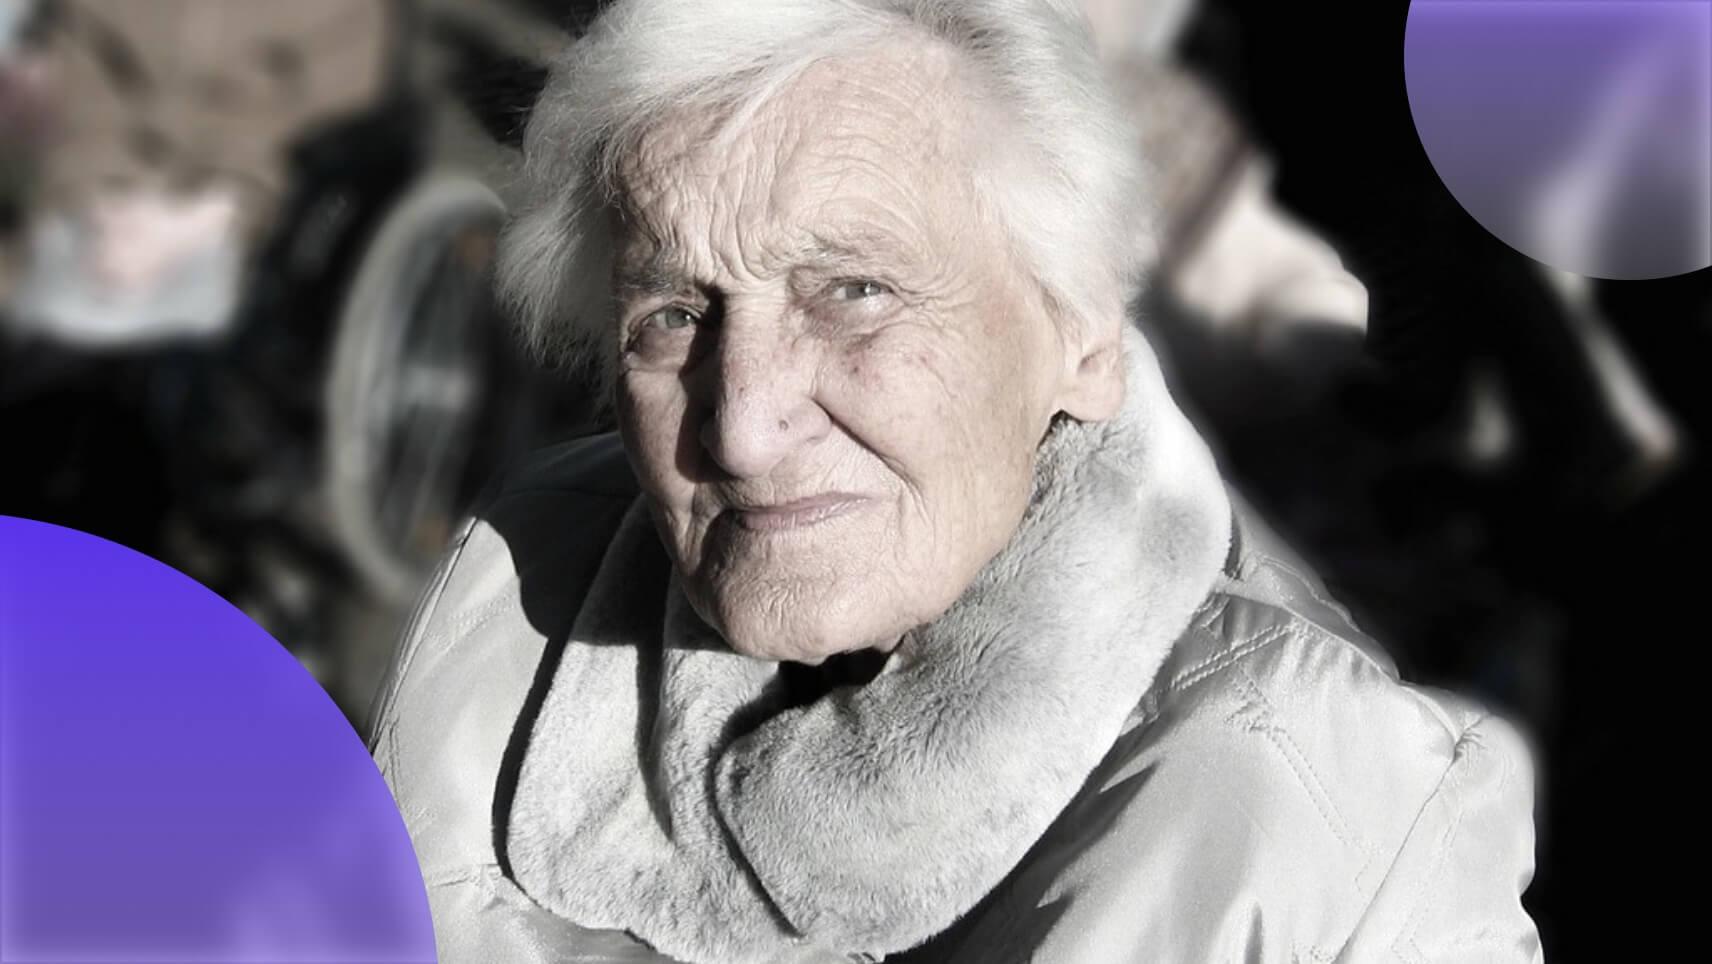 Smart Lighting: Healthy Lighting for Nursing Institutions for the Aged